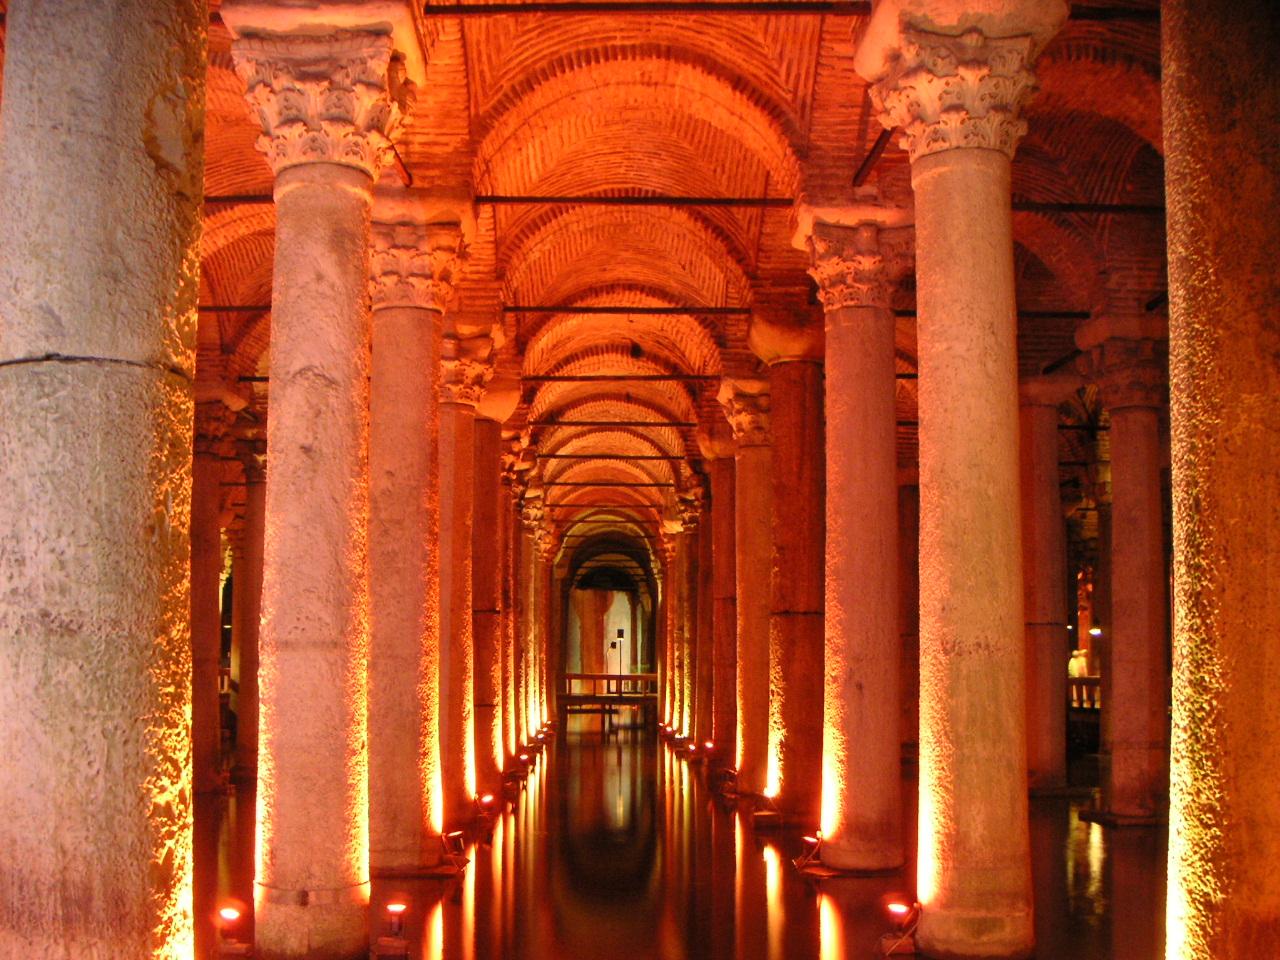 File:Basilica cistern 2.jpg - Wikimedia Commons